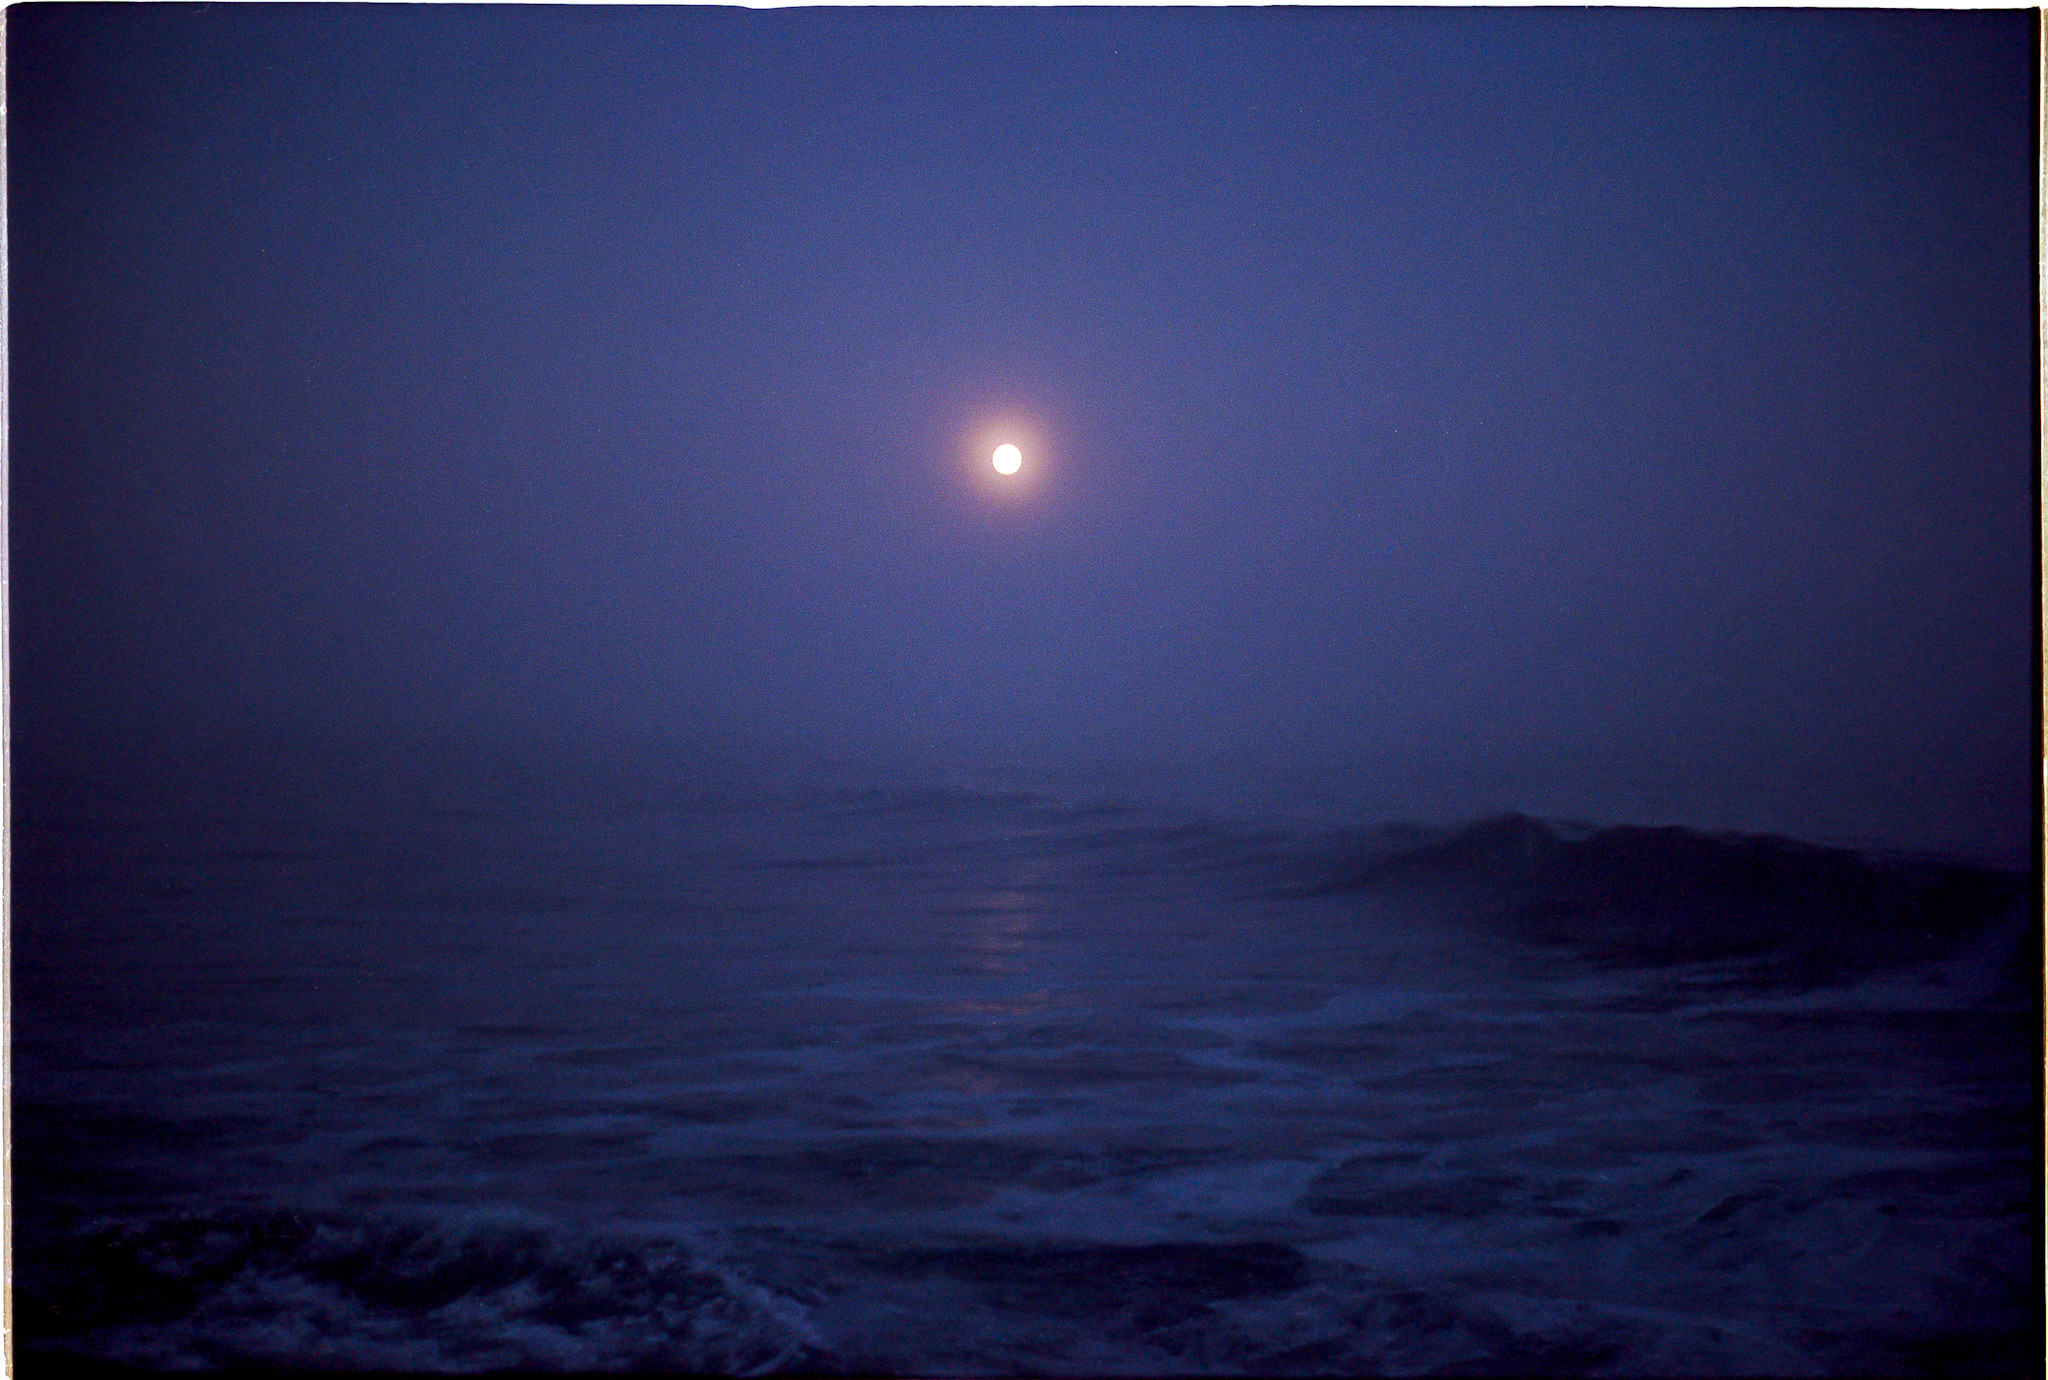 Silent Planet by Carl McLaughlin